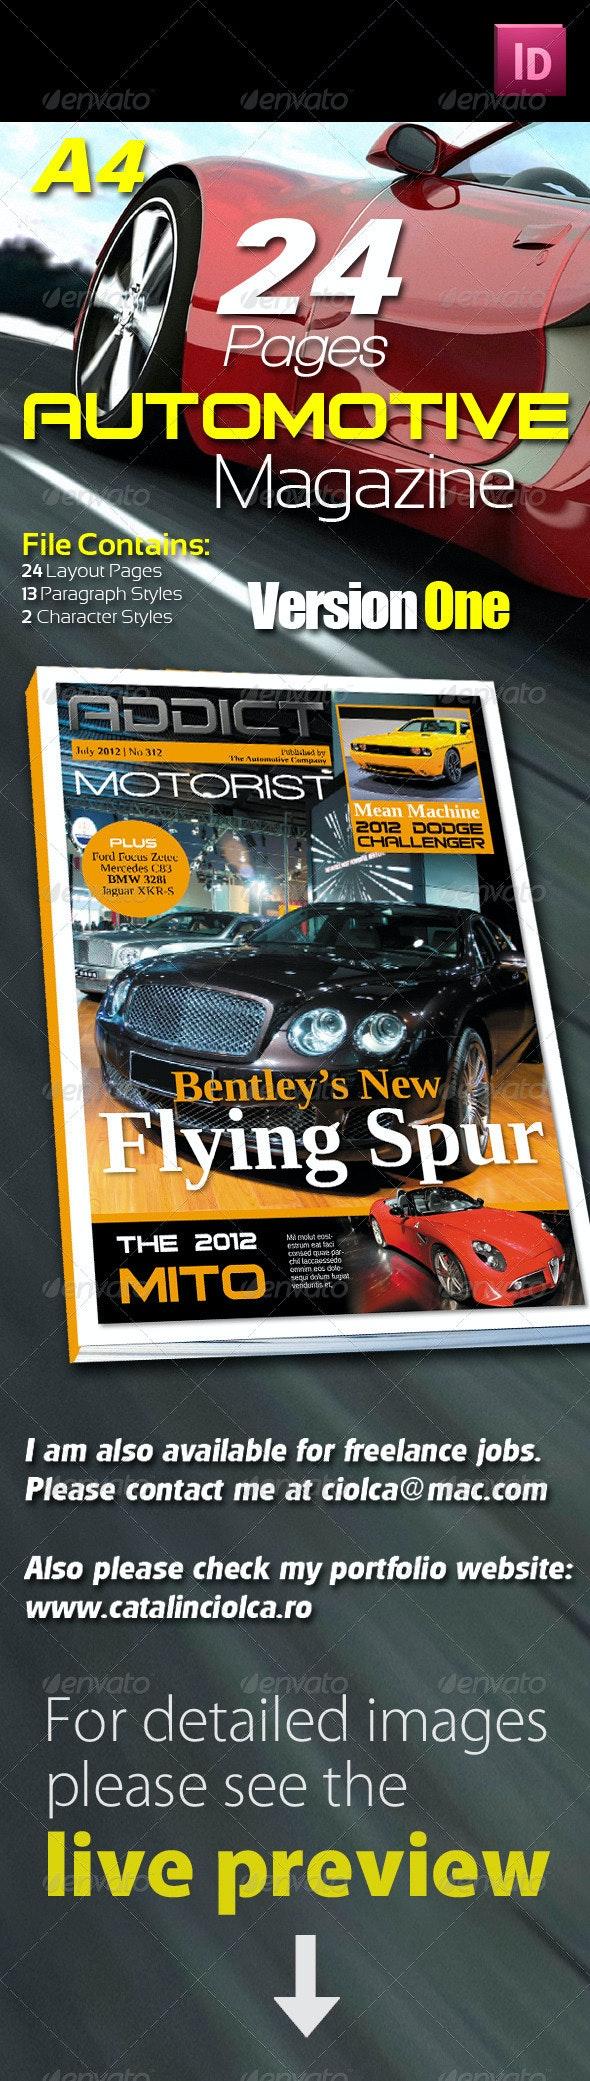 24 Pages Automotive Magazine Version One - Magazines Print Templates